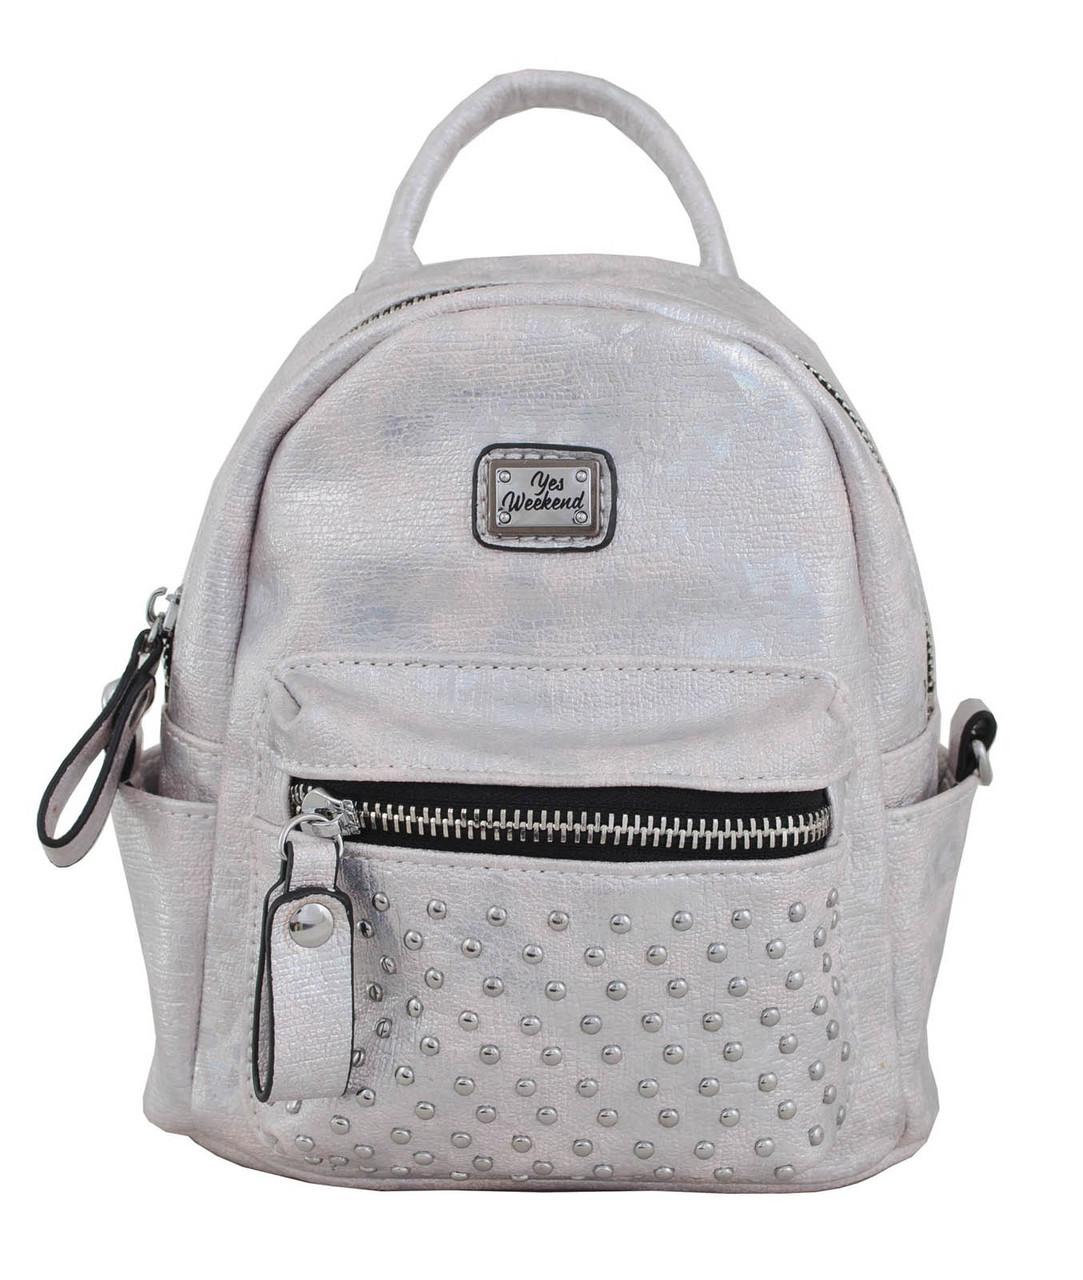 e82e6b13a2a4 Женская сумка-рюкзак из экокожи, 1 ВЕРЕСНЯ, 553231 — только ...